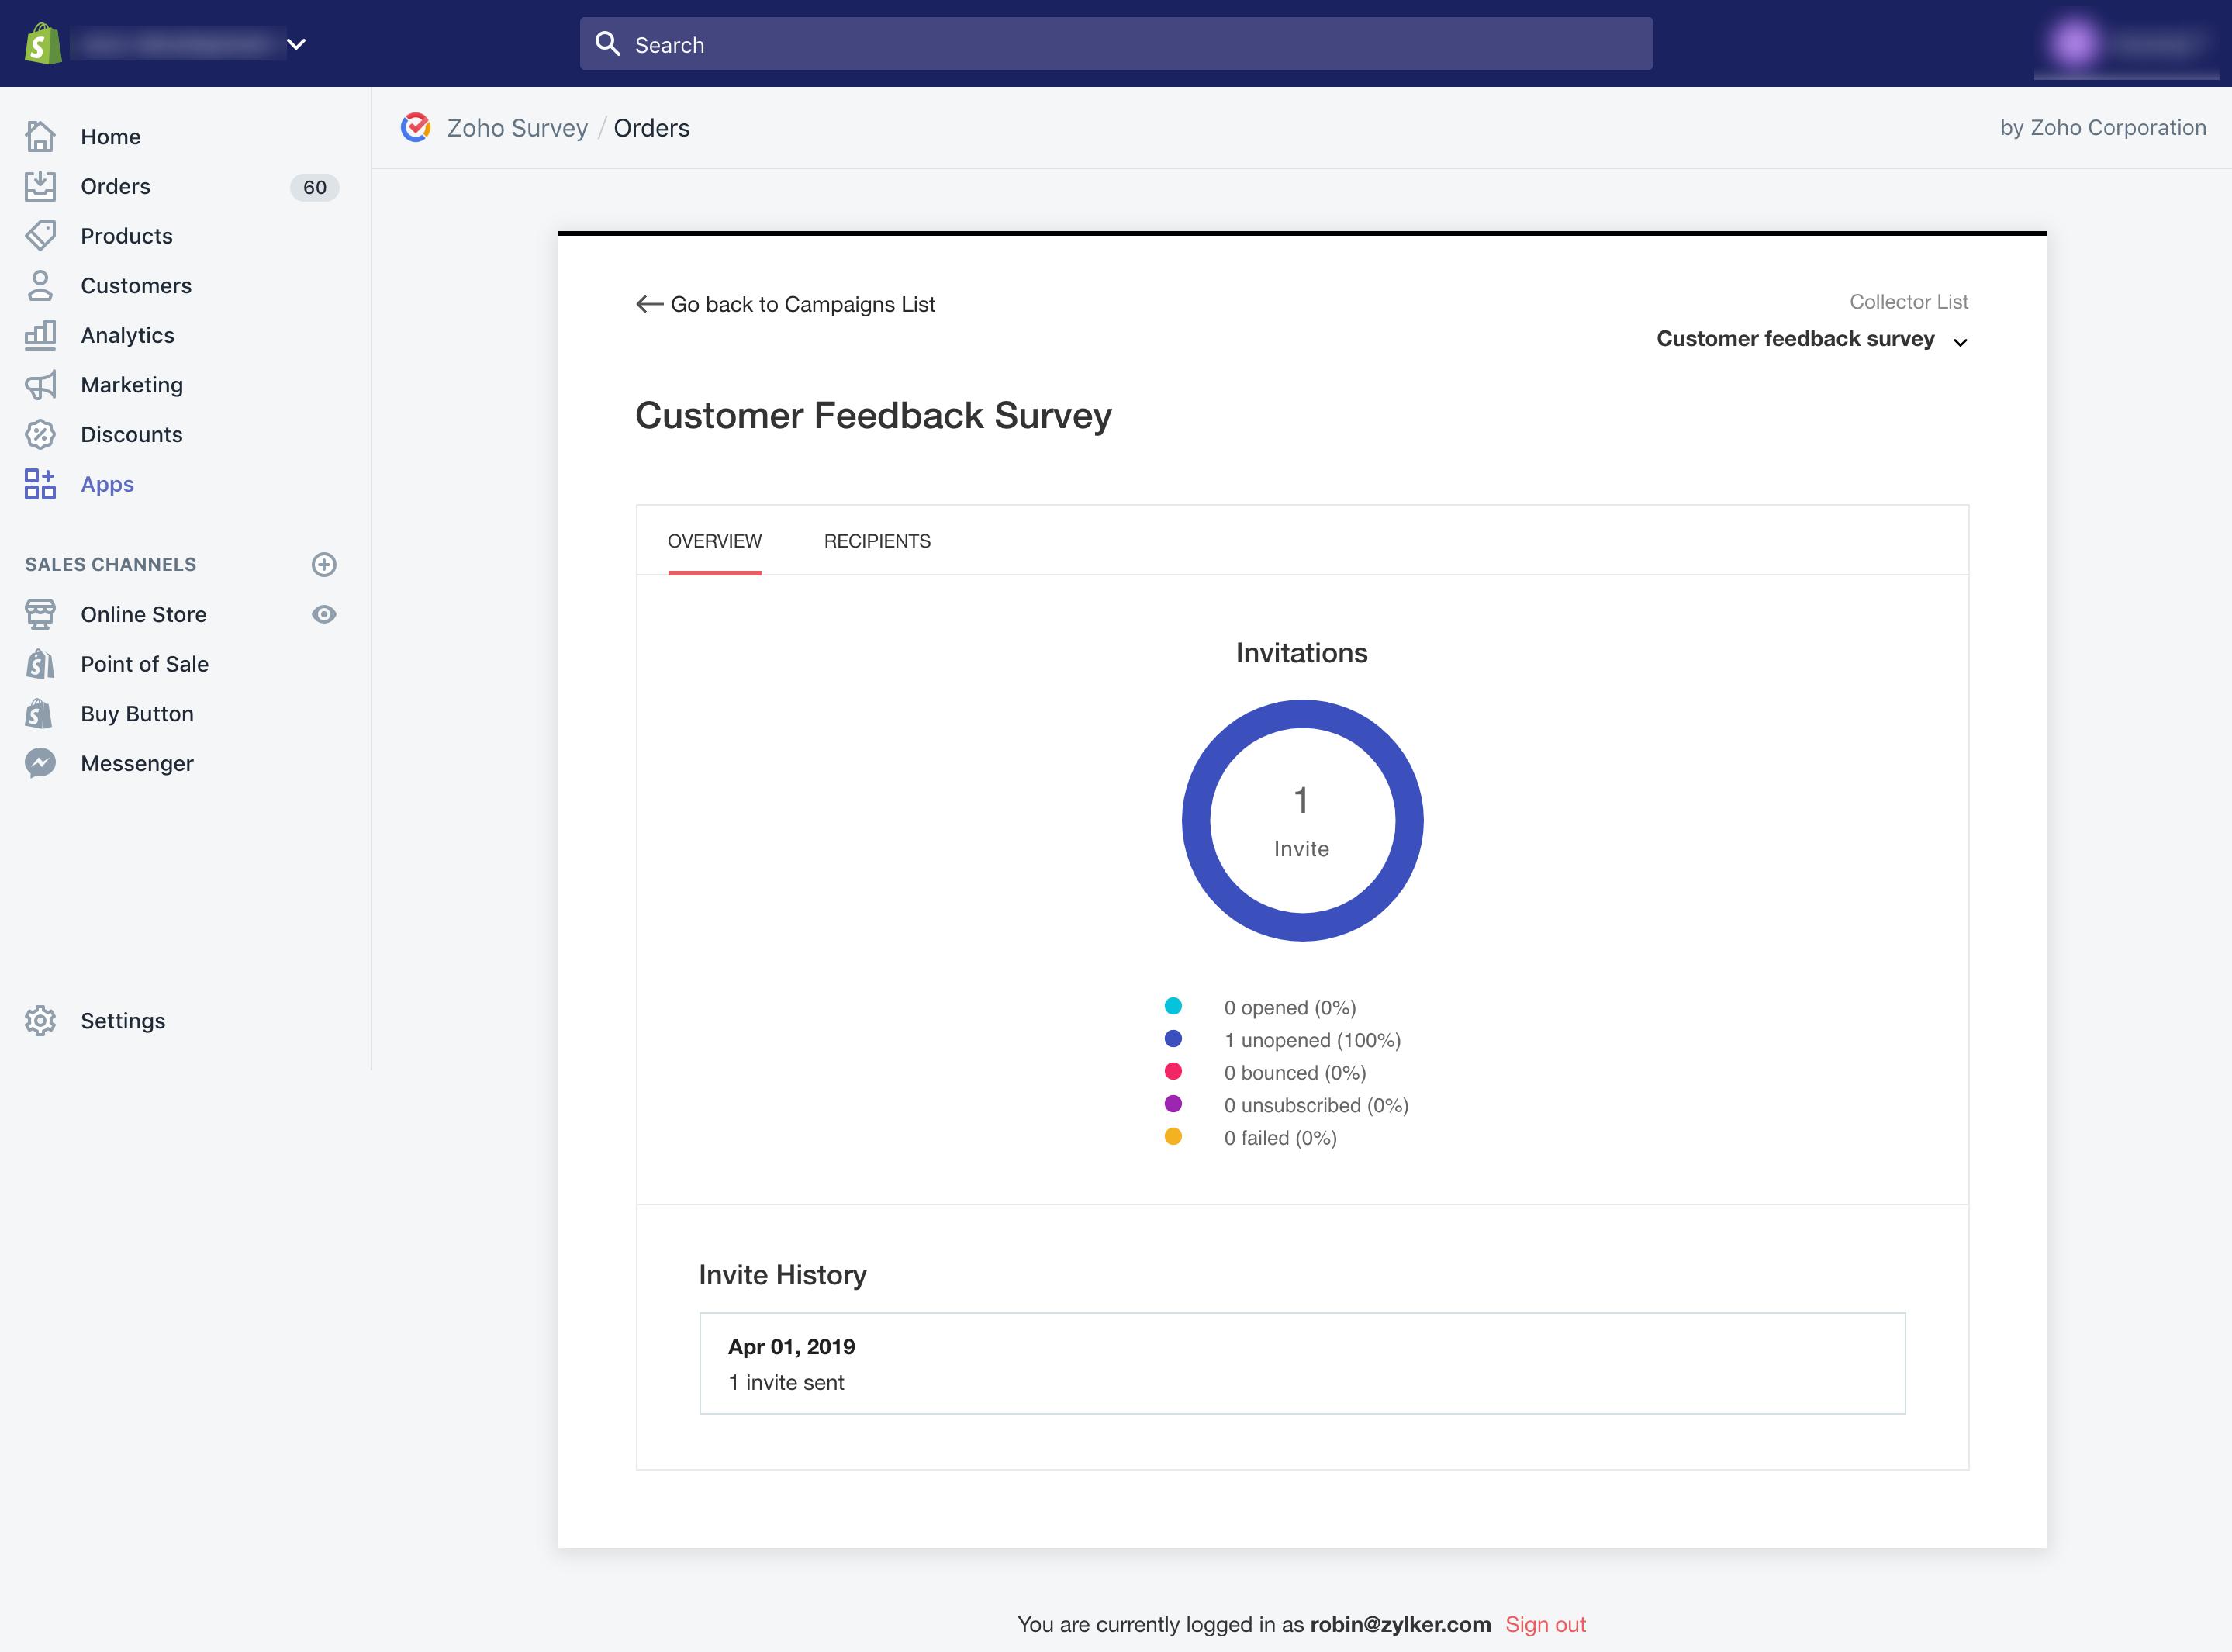 Zoho Survey Shopify order overview